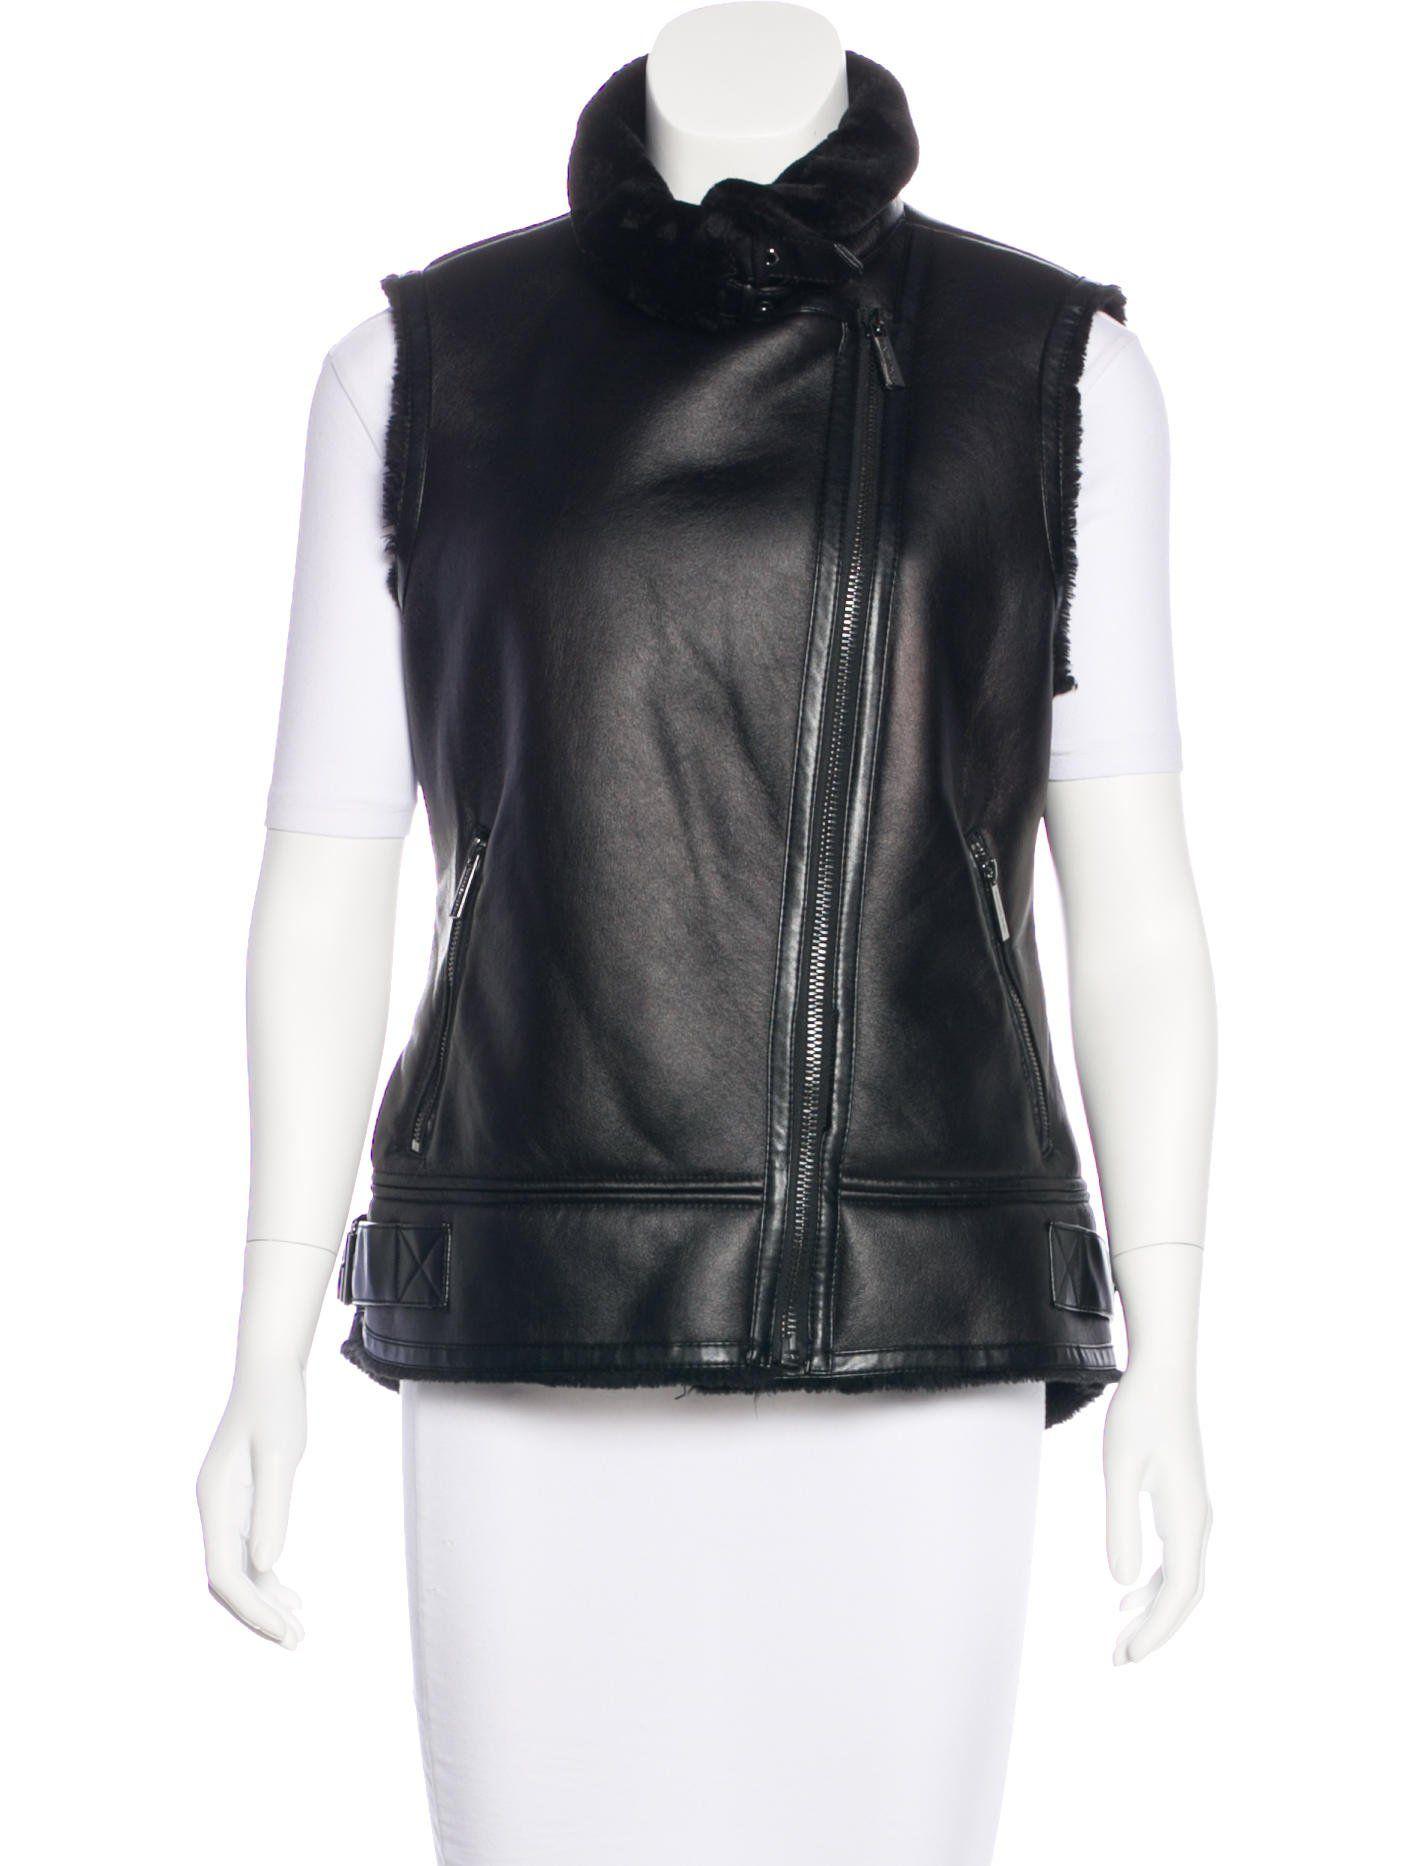 9905a910a5b Michael Michael Kors Sleeveless Zip-Up Vest - Clothing - WM525338 | The  RealReal